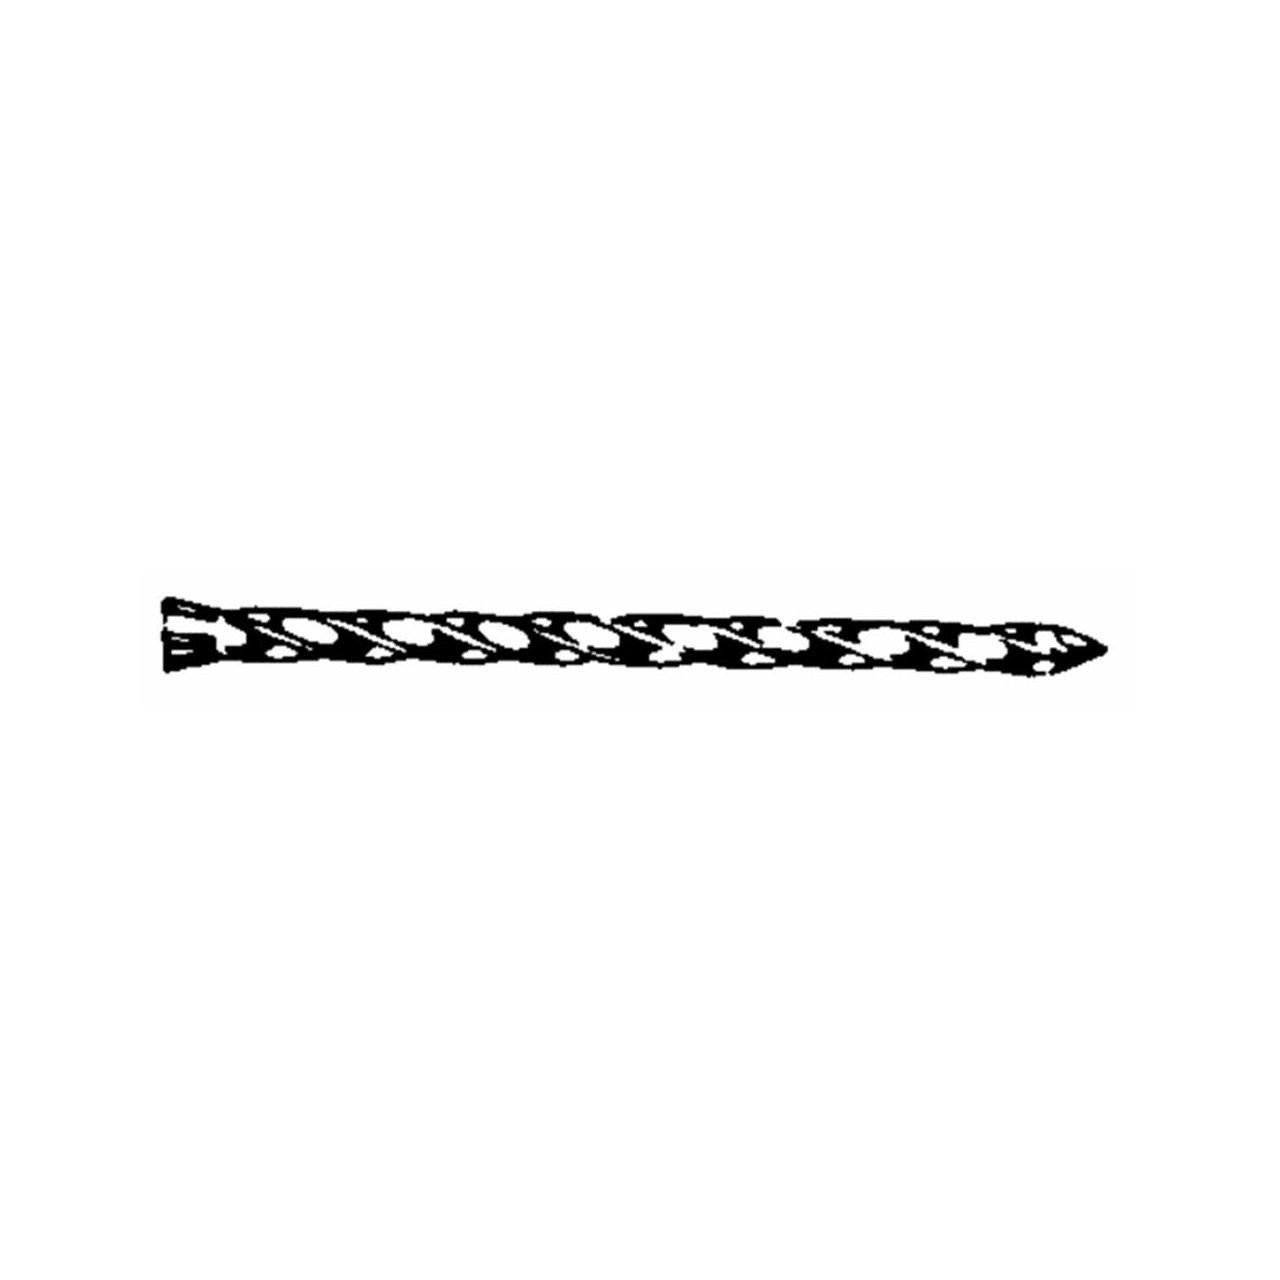 Maze, W. H. HF167112 Hardened Flooring Nails